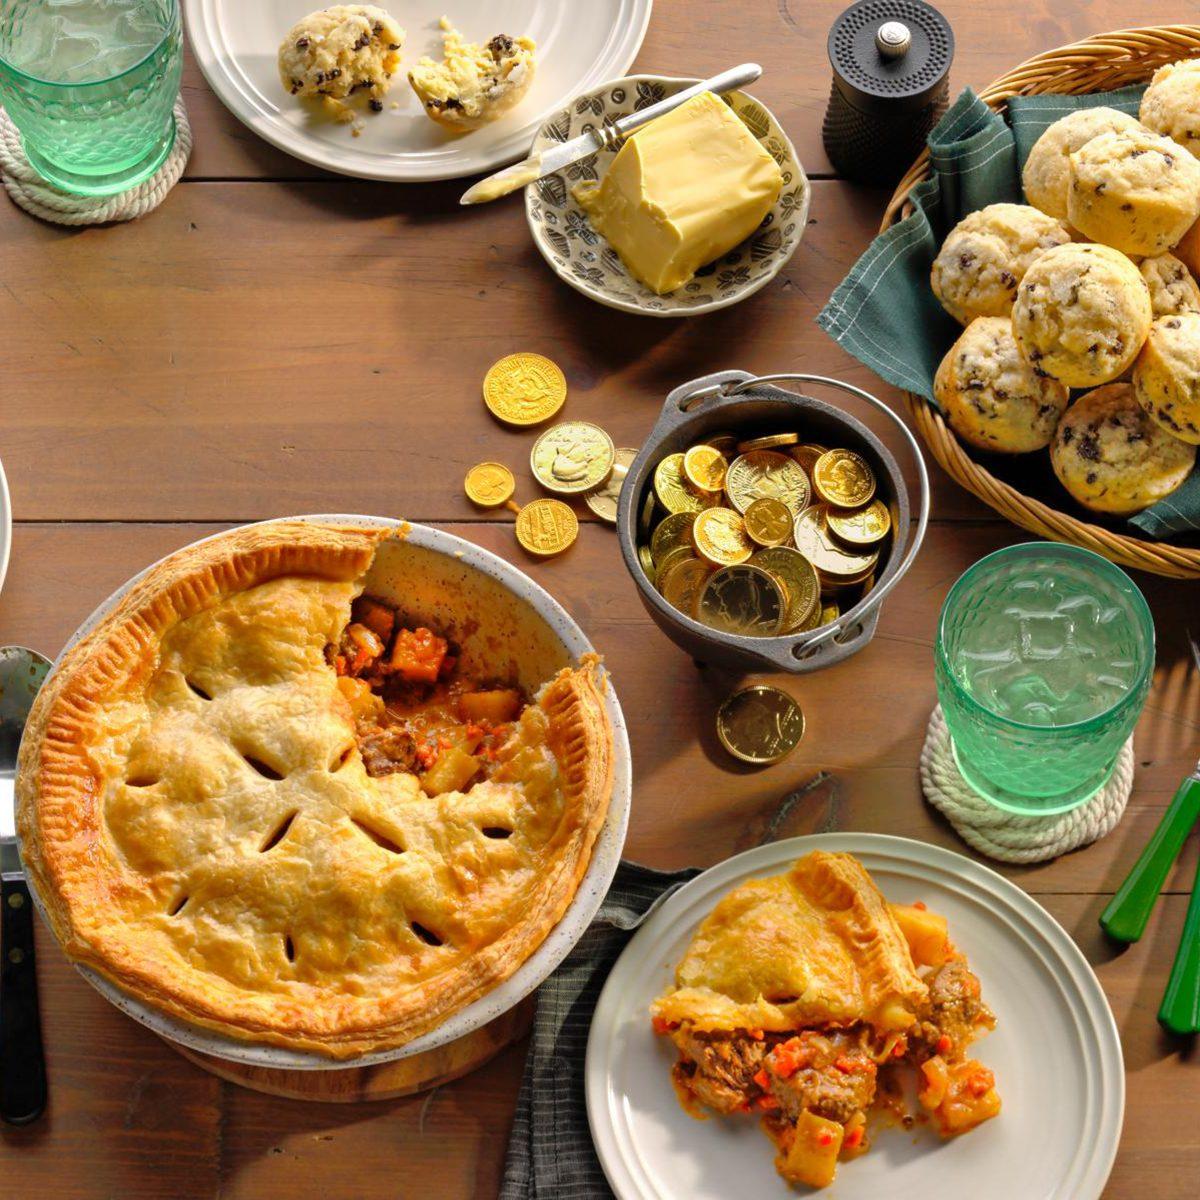 assortment of irish food on table